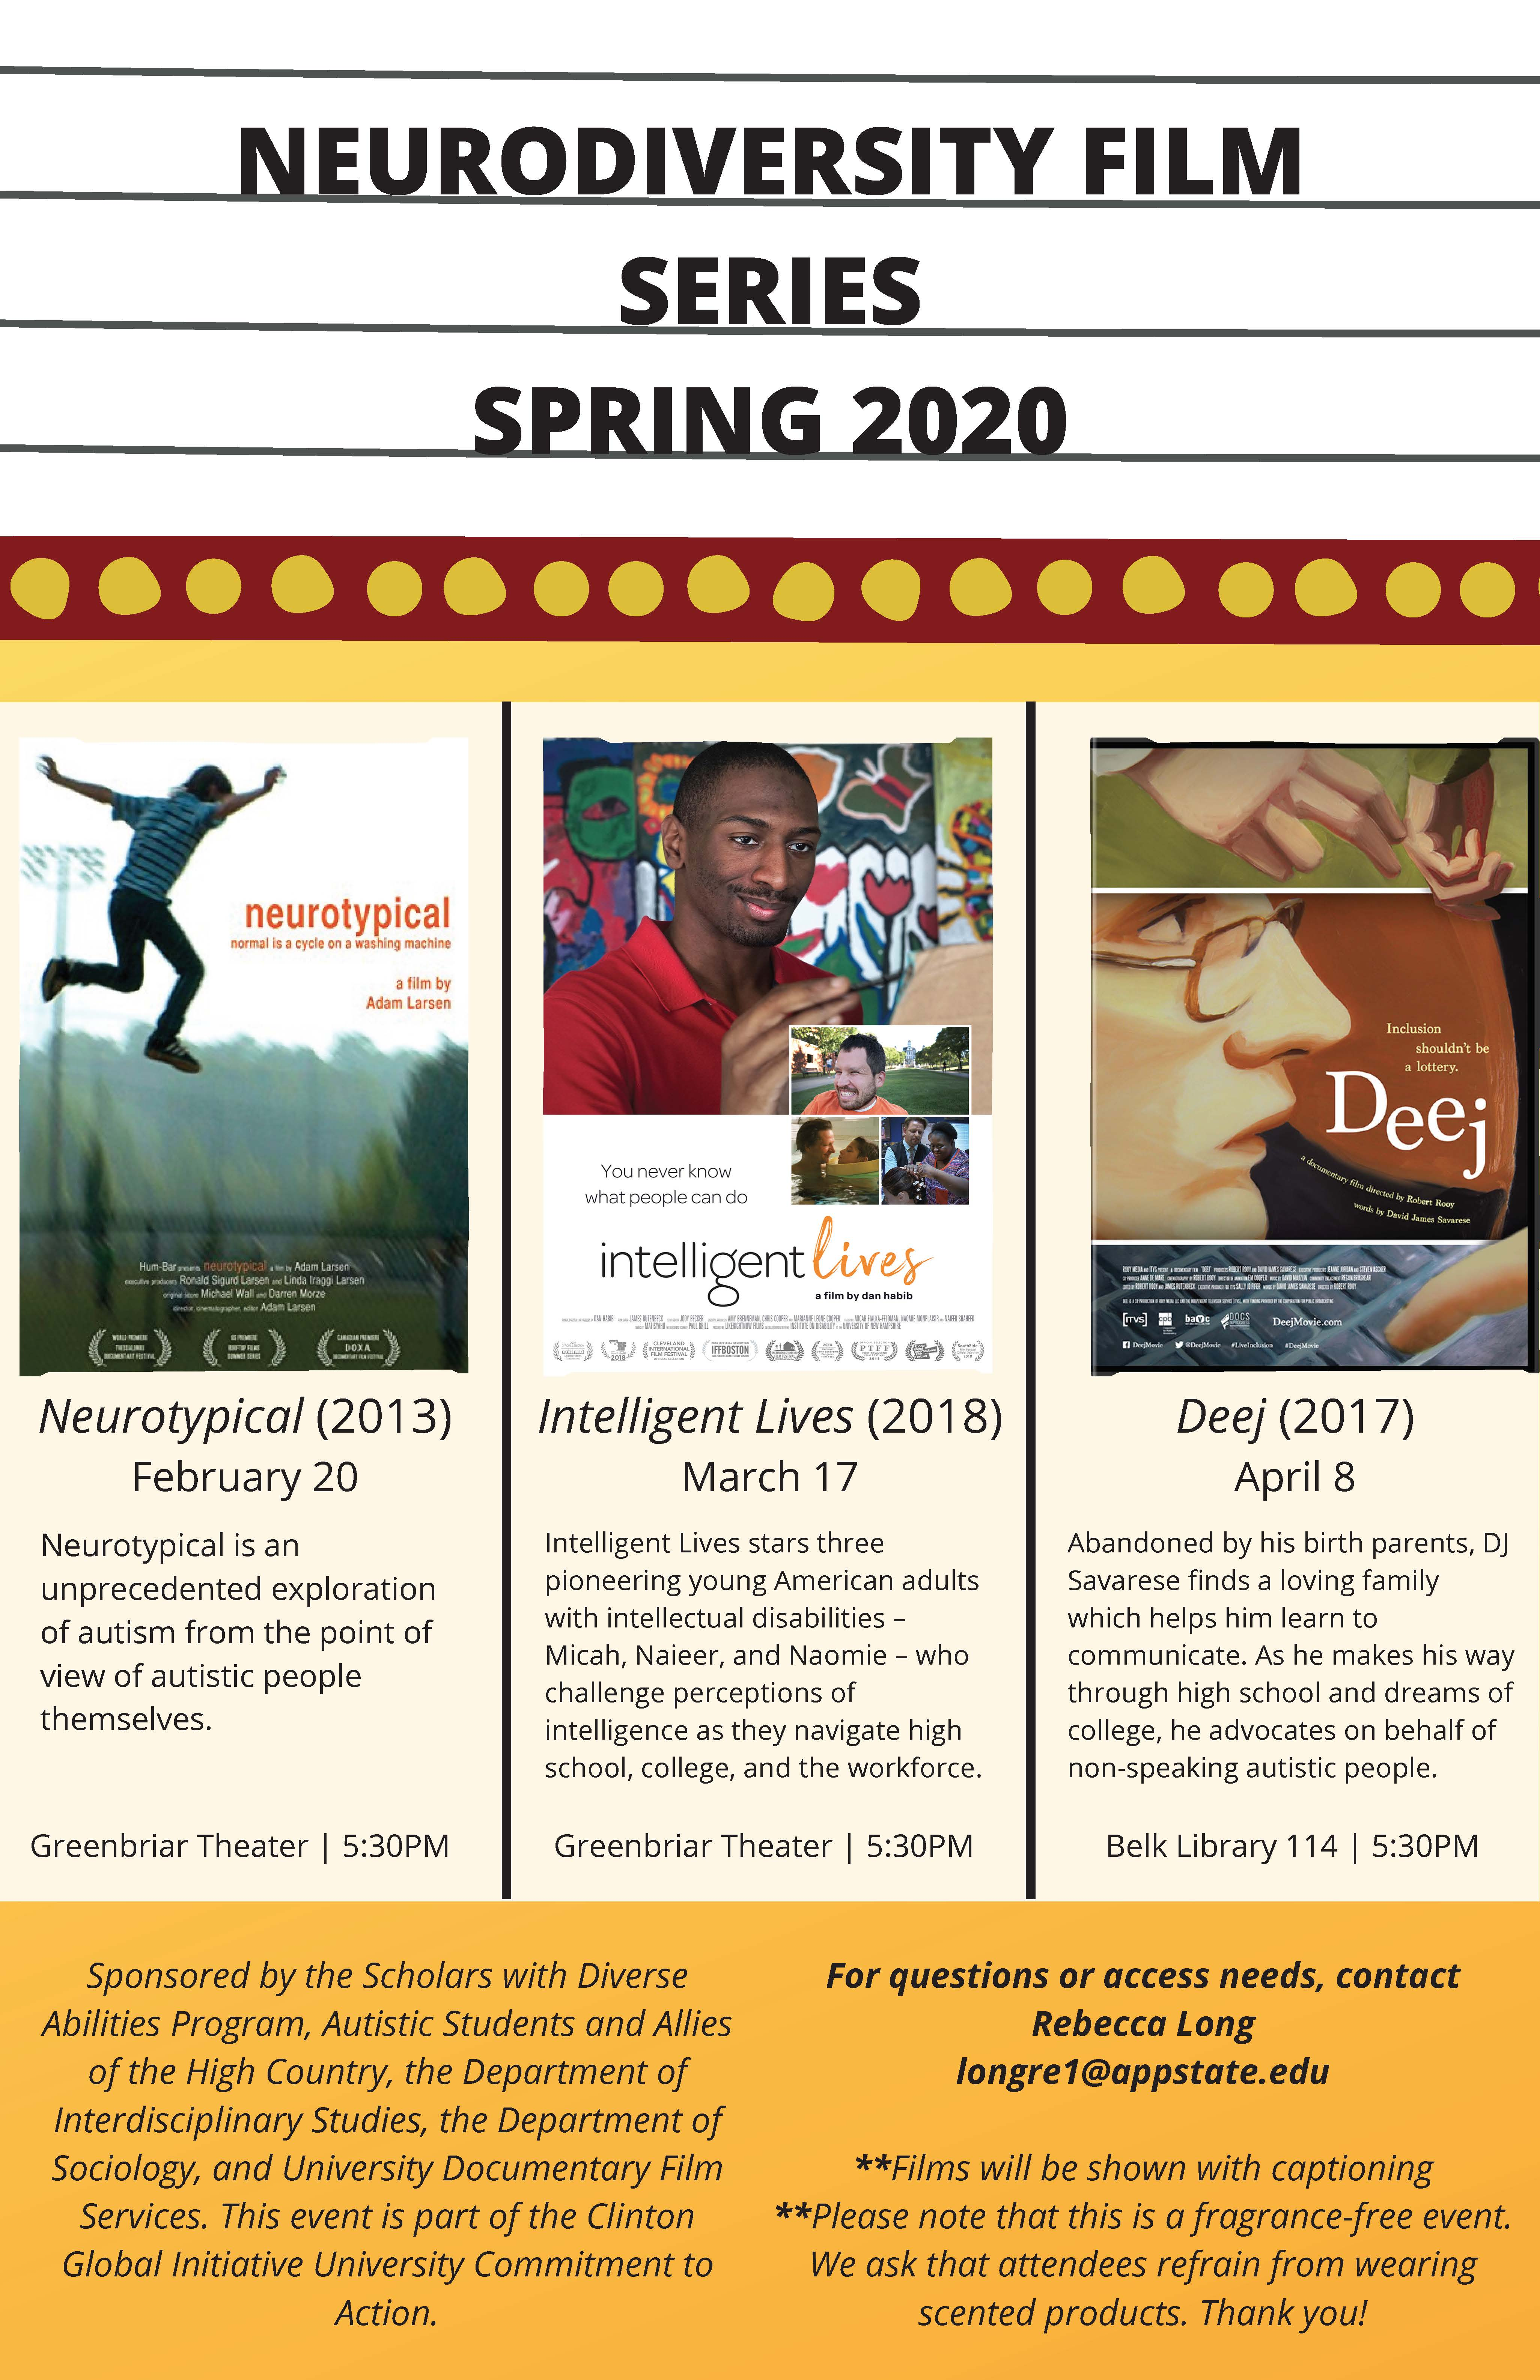 neurodiversity film series